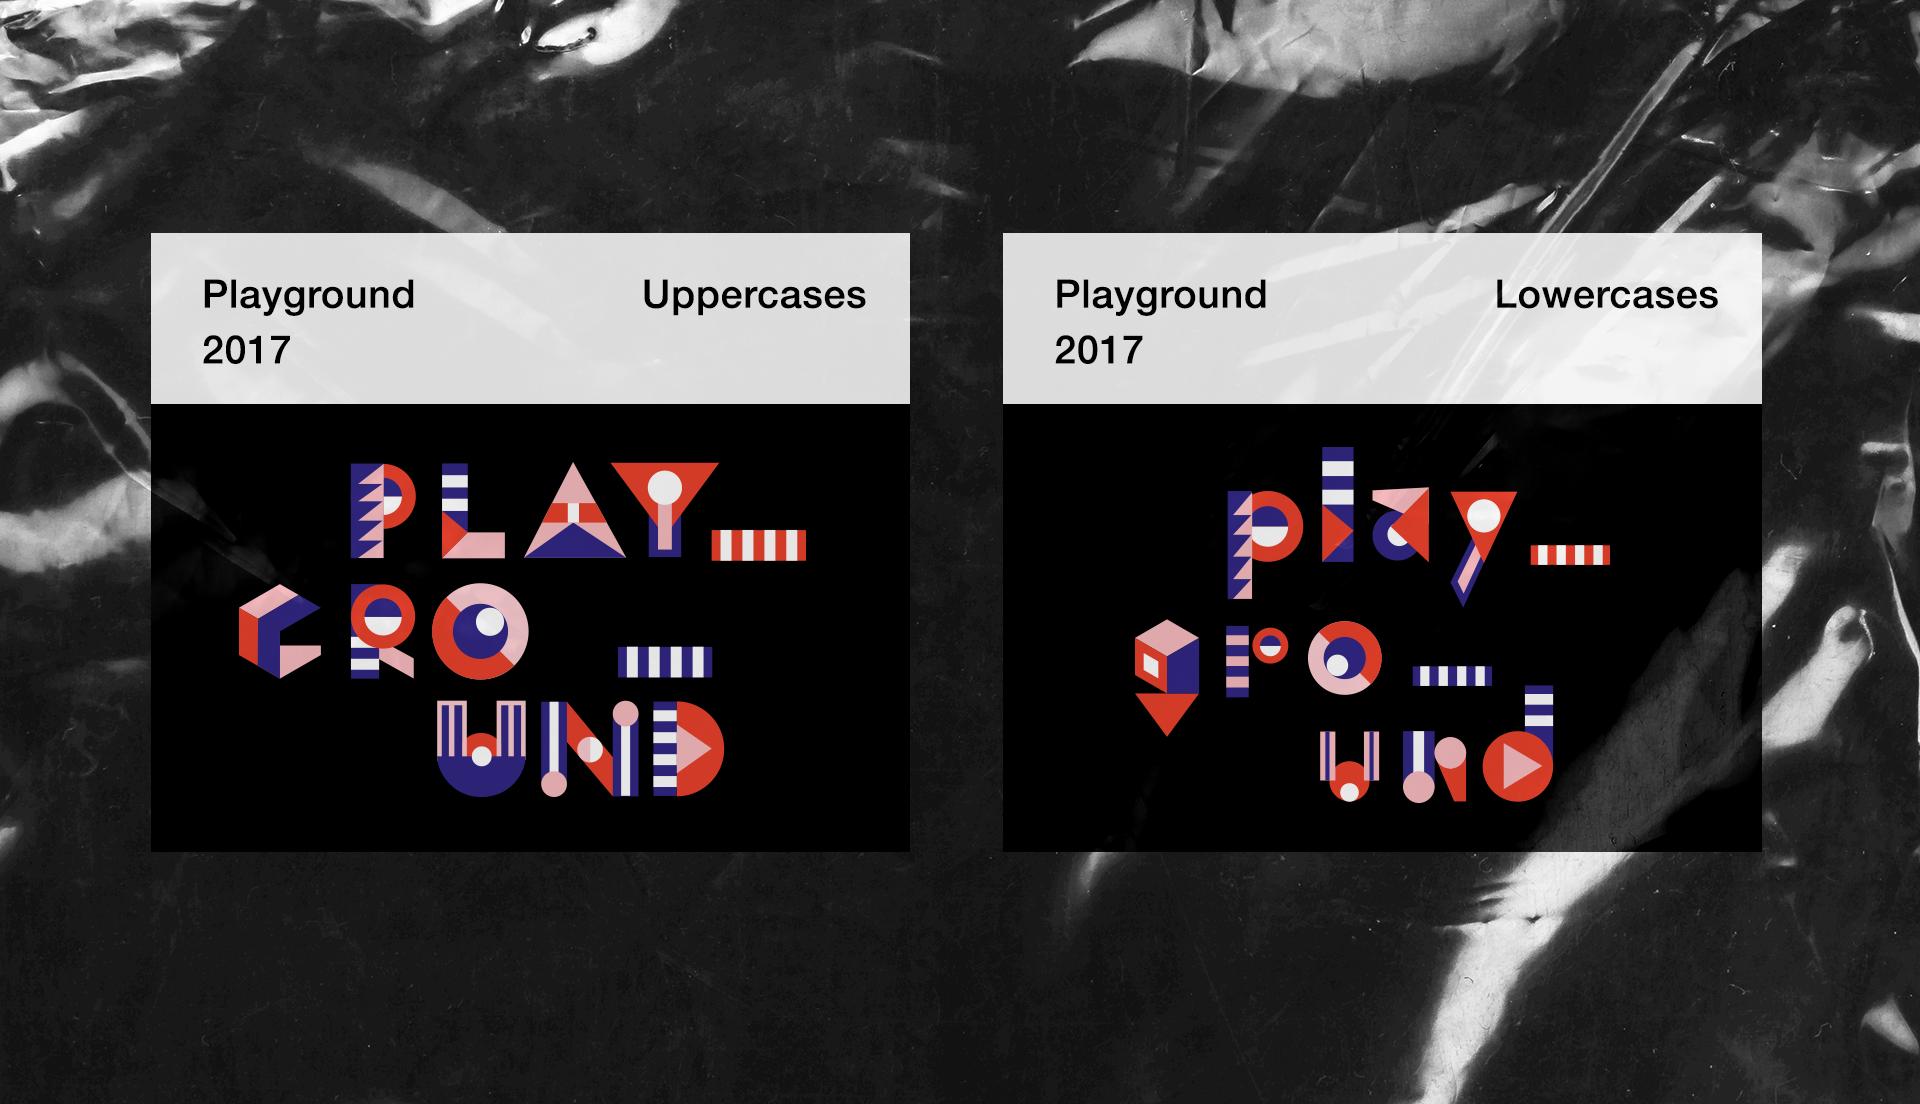 Playgroundplay-7-copie